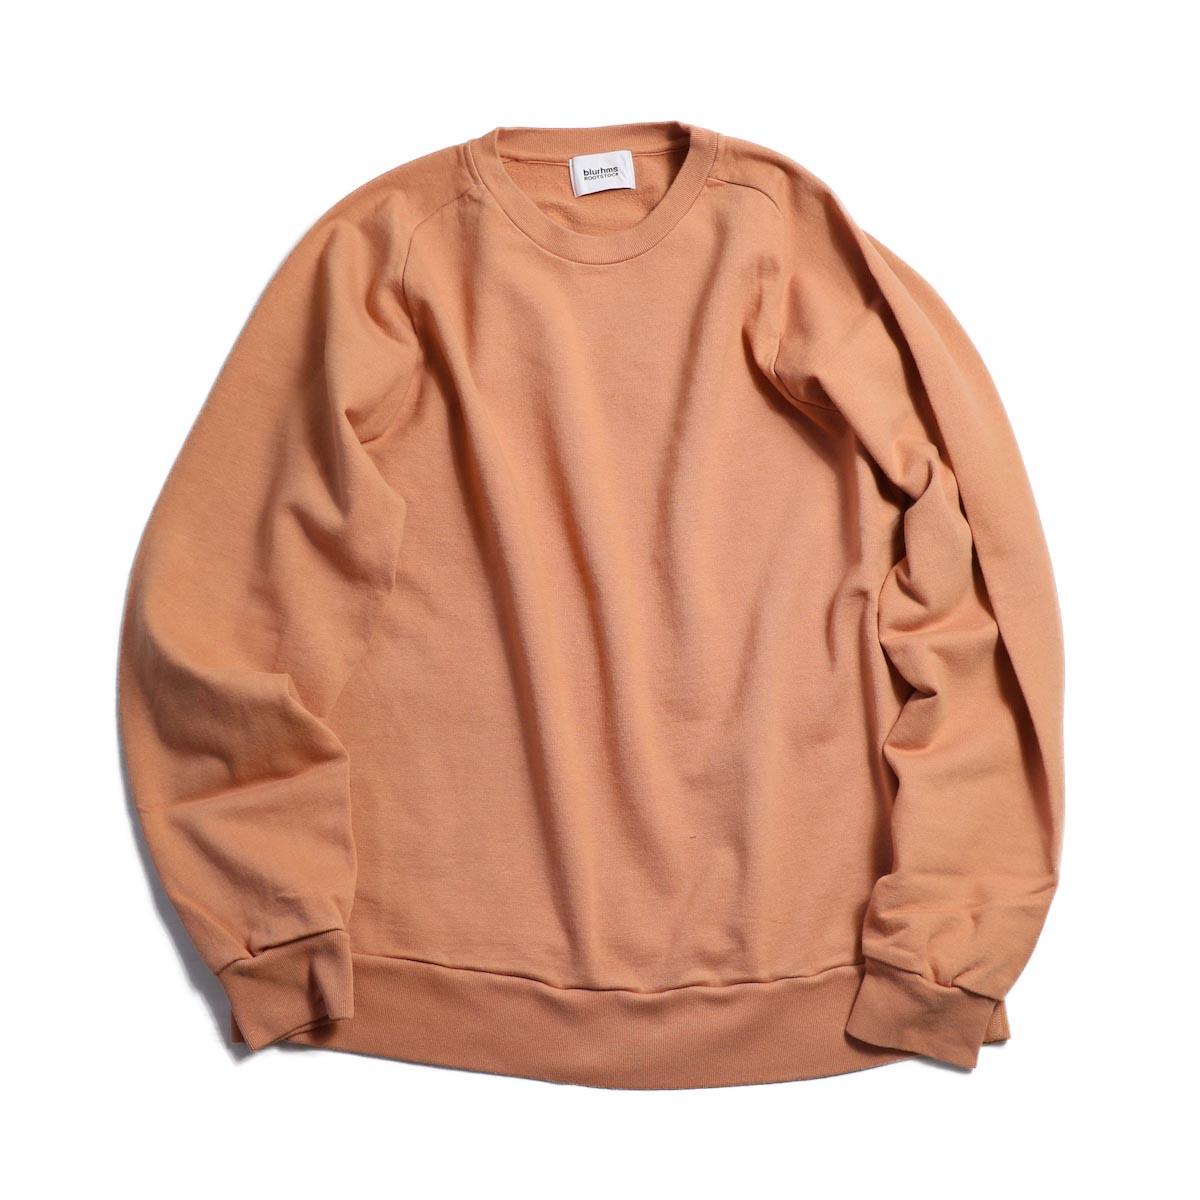 blurhms / Freedom Sleeve Sweat Shirt - Apricot